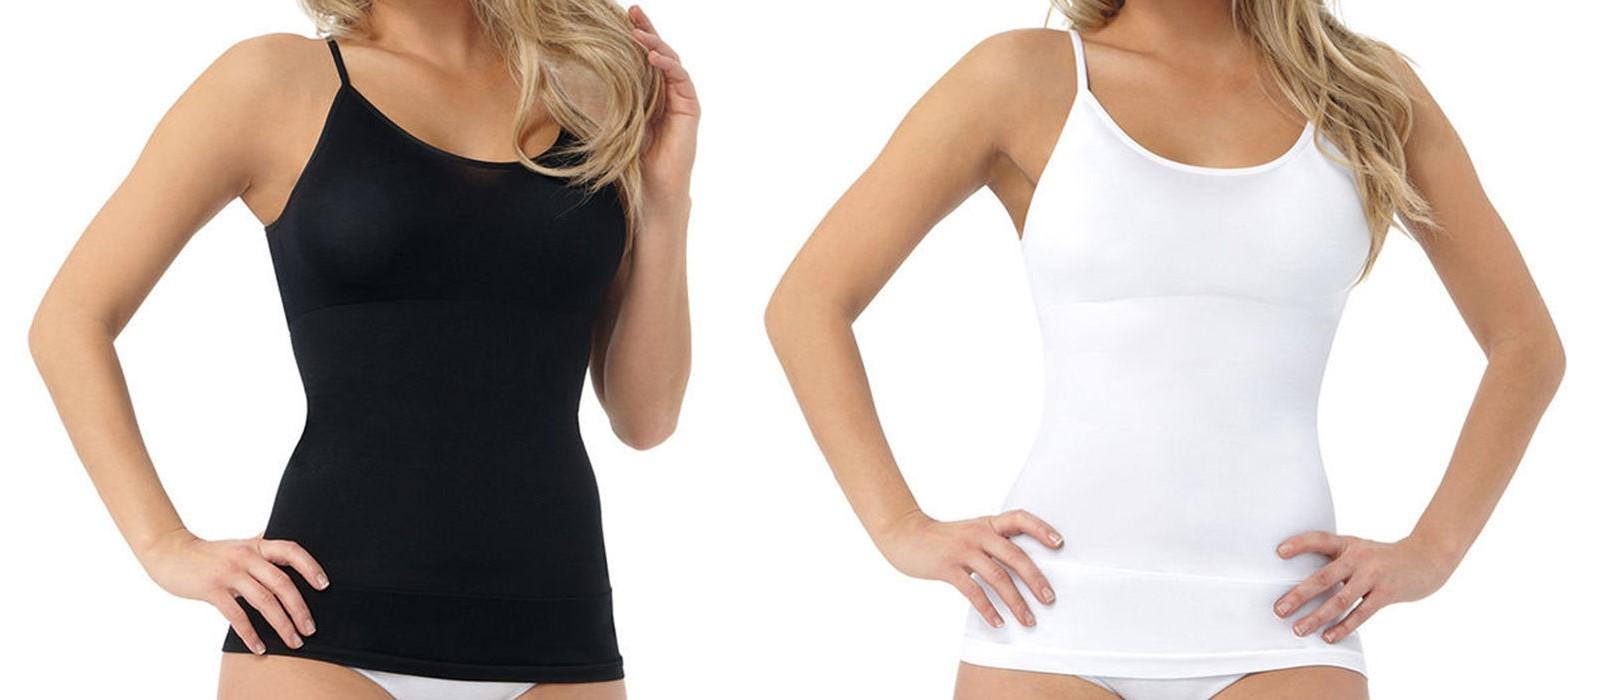 BELVIA figurformendes Shapewear Top in schwarz Größe XL